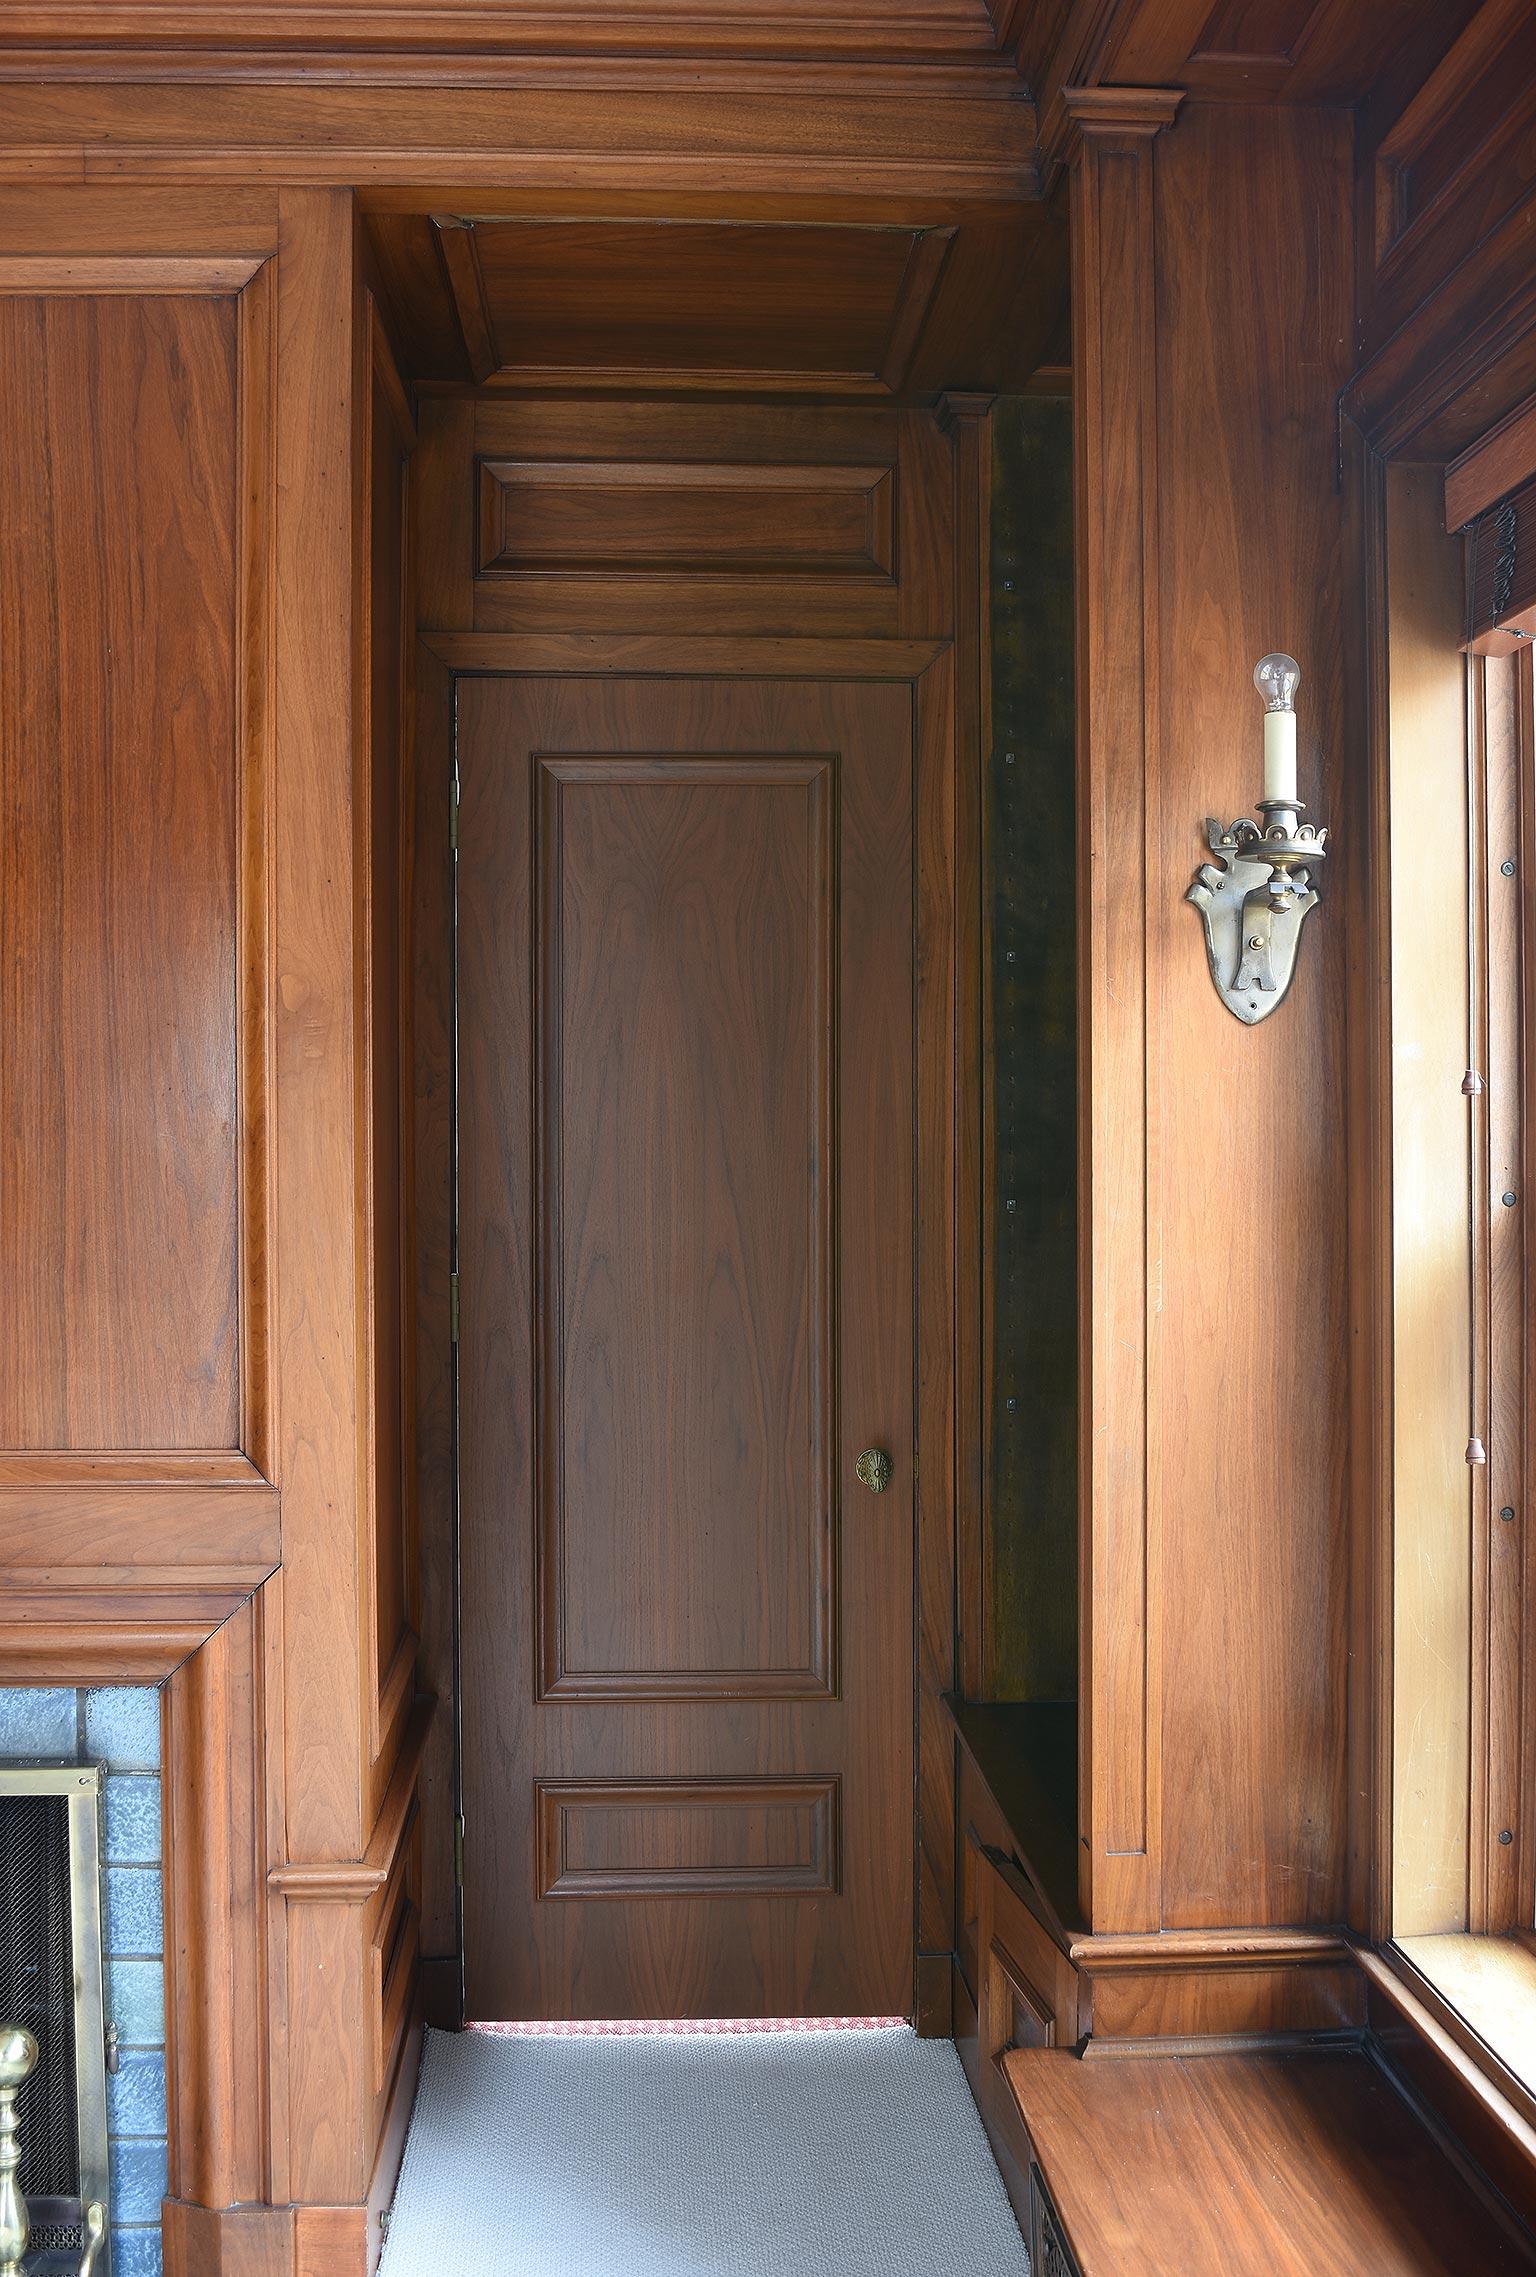 maher-sidedoor.jpg